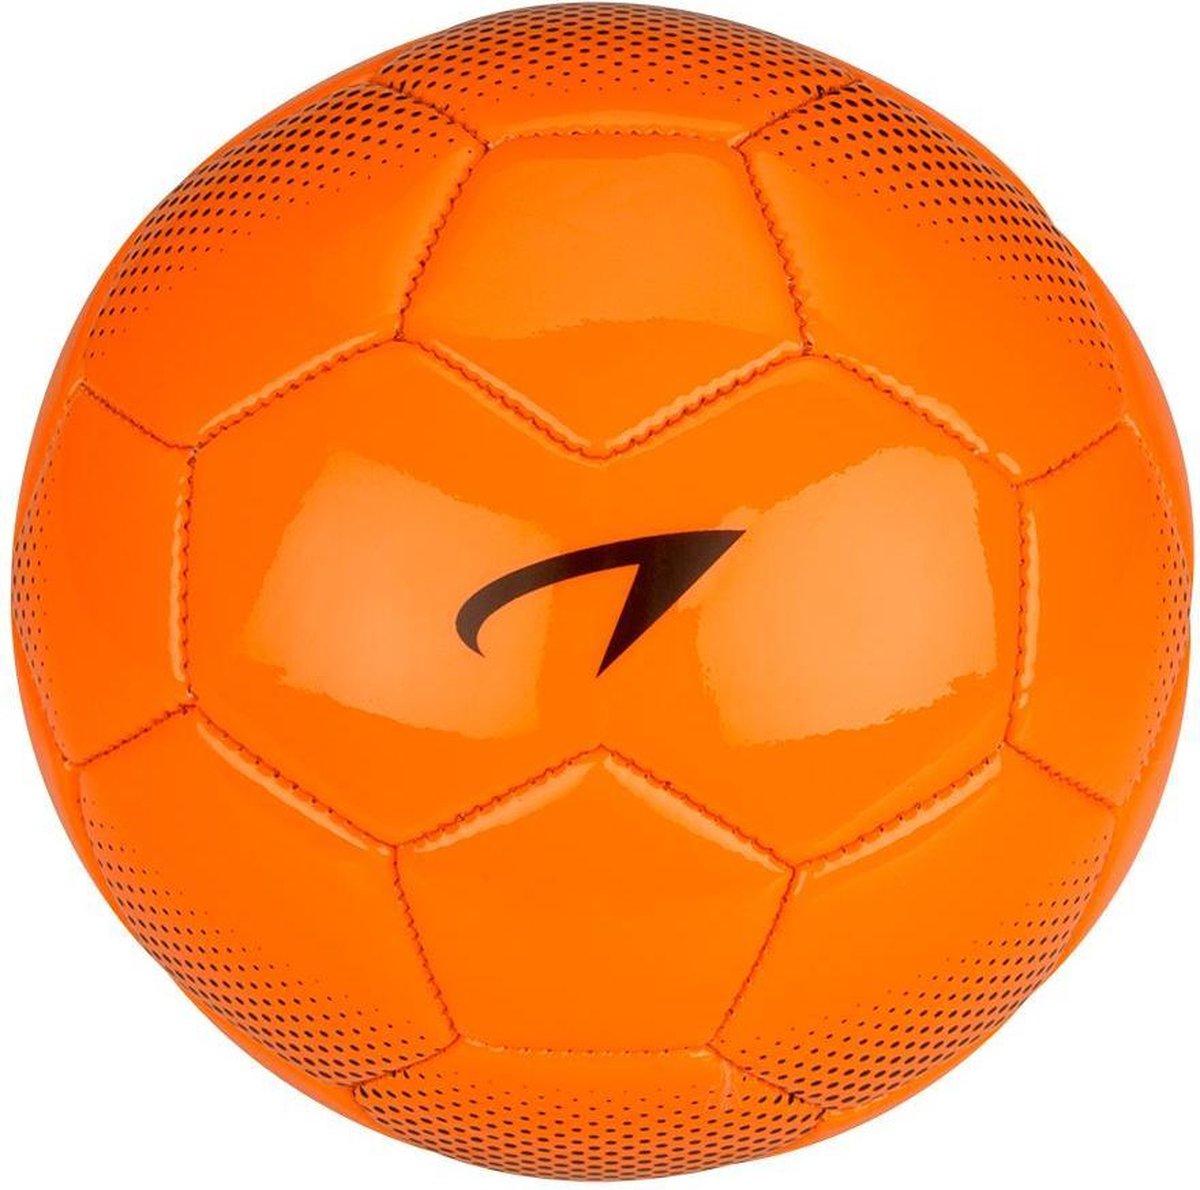 Avento Mini Voetbal Glossy 2 - Fluororanje/Zwart - 2 - Avento